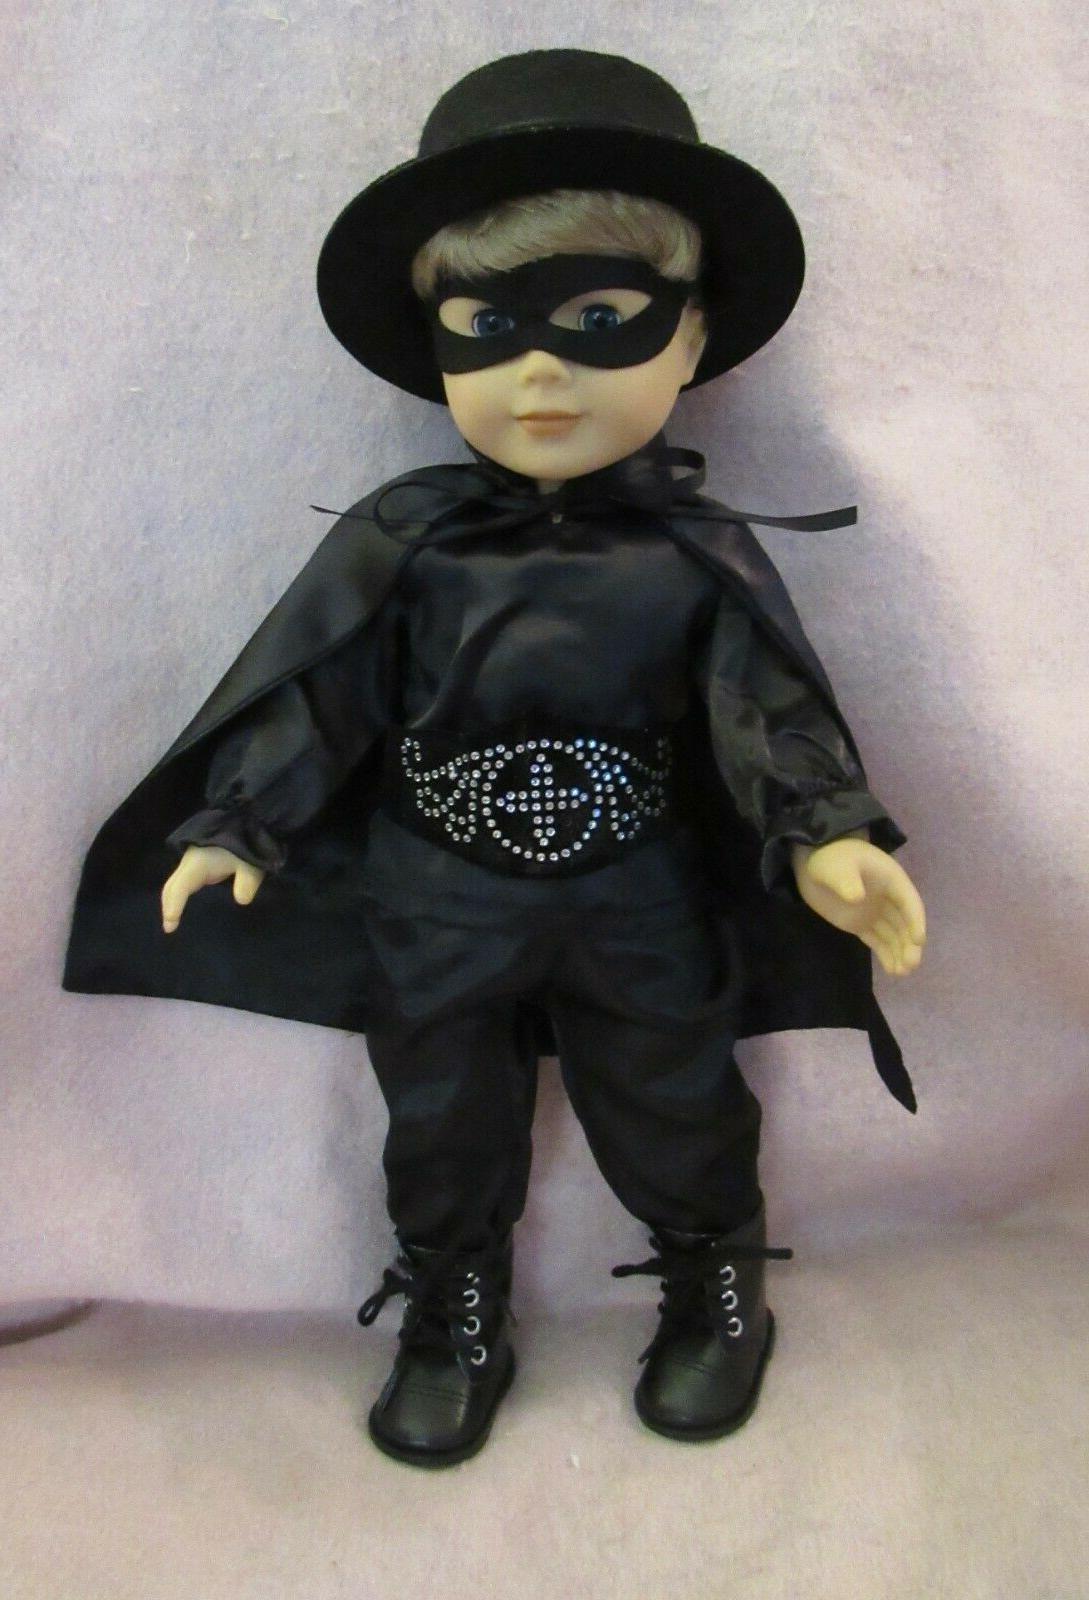 zorro set fits american boy doll 18